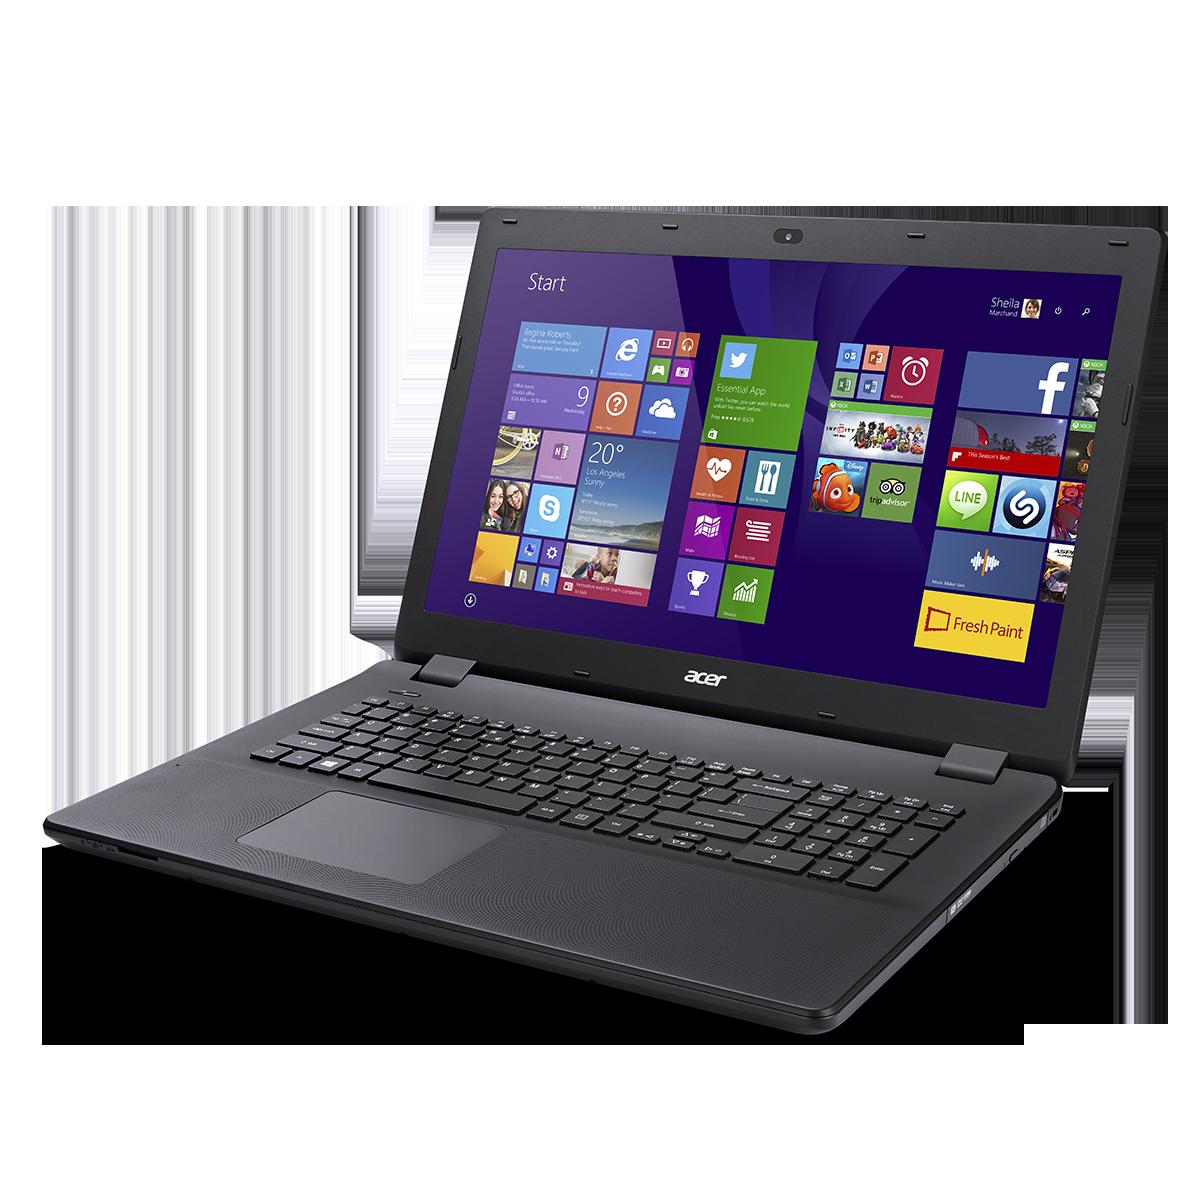 aspire es1 731 p6gb laptops tech specs reviews acer. Black Bedroom Furniture Sets. Home Design Ideas